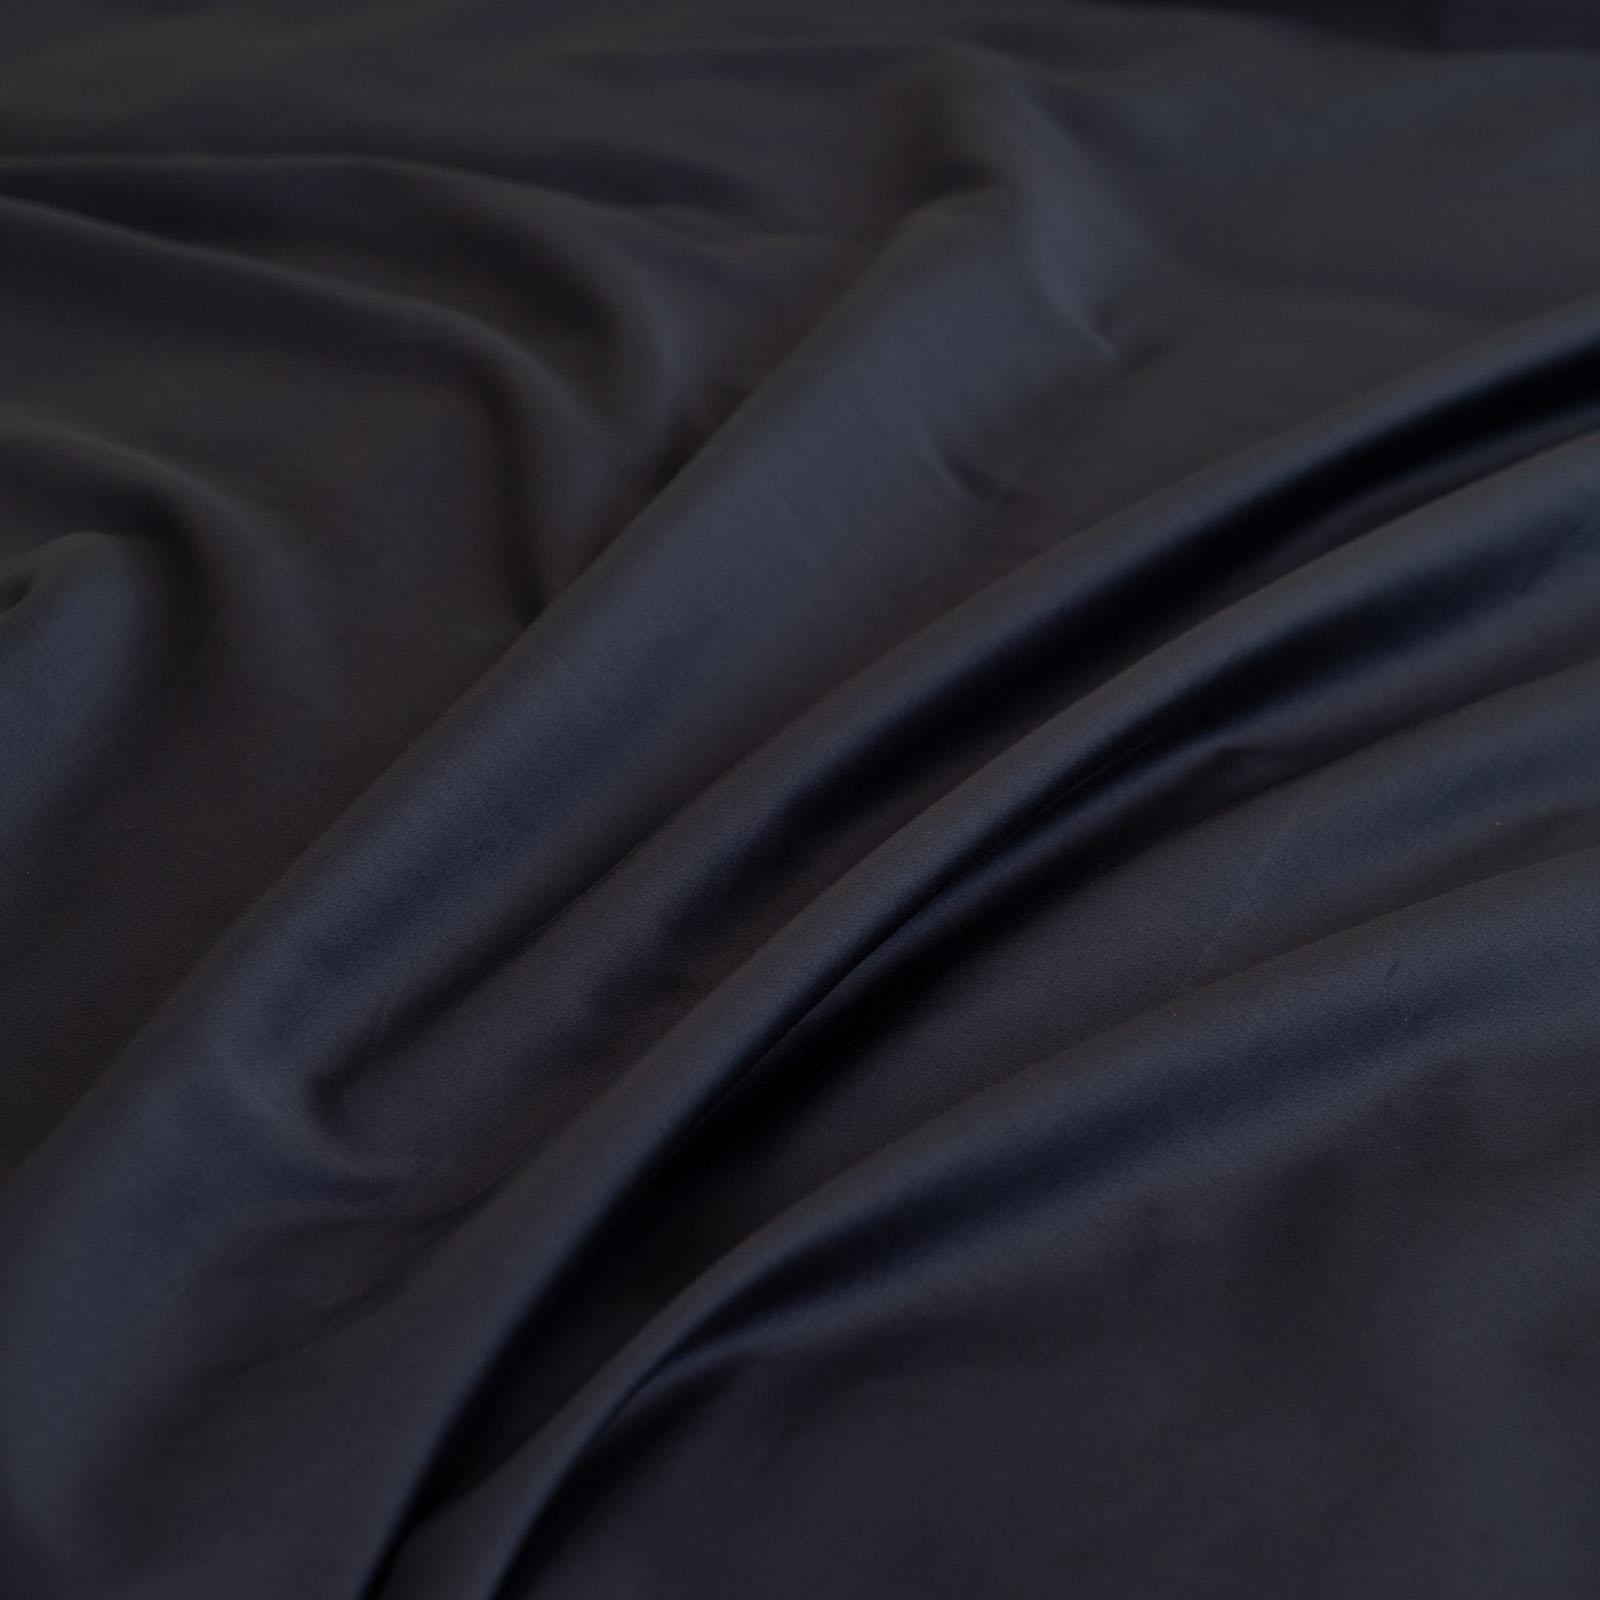 thumbnail 29 - Royal Comfort 1000TC Hotel Grade Bamboo Cotton Sheets Pillowcases Set Ultrasoft